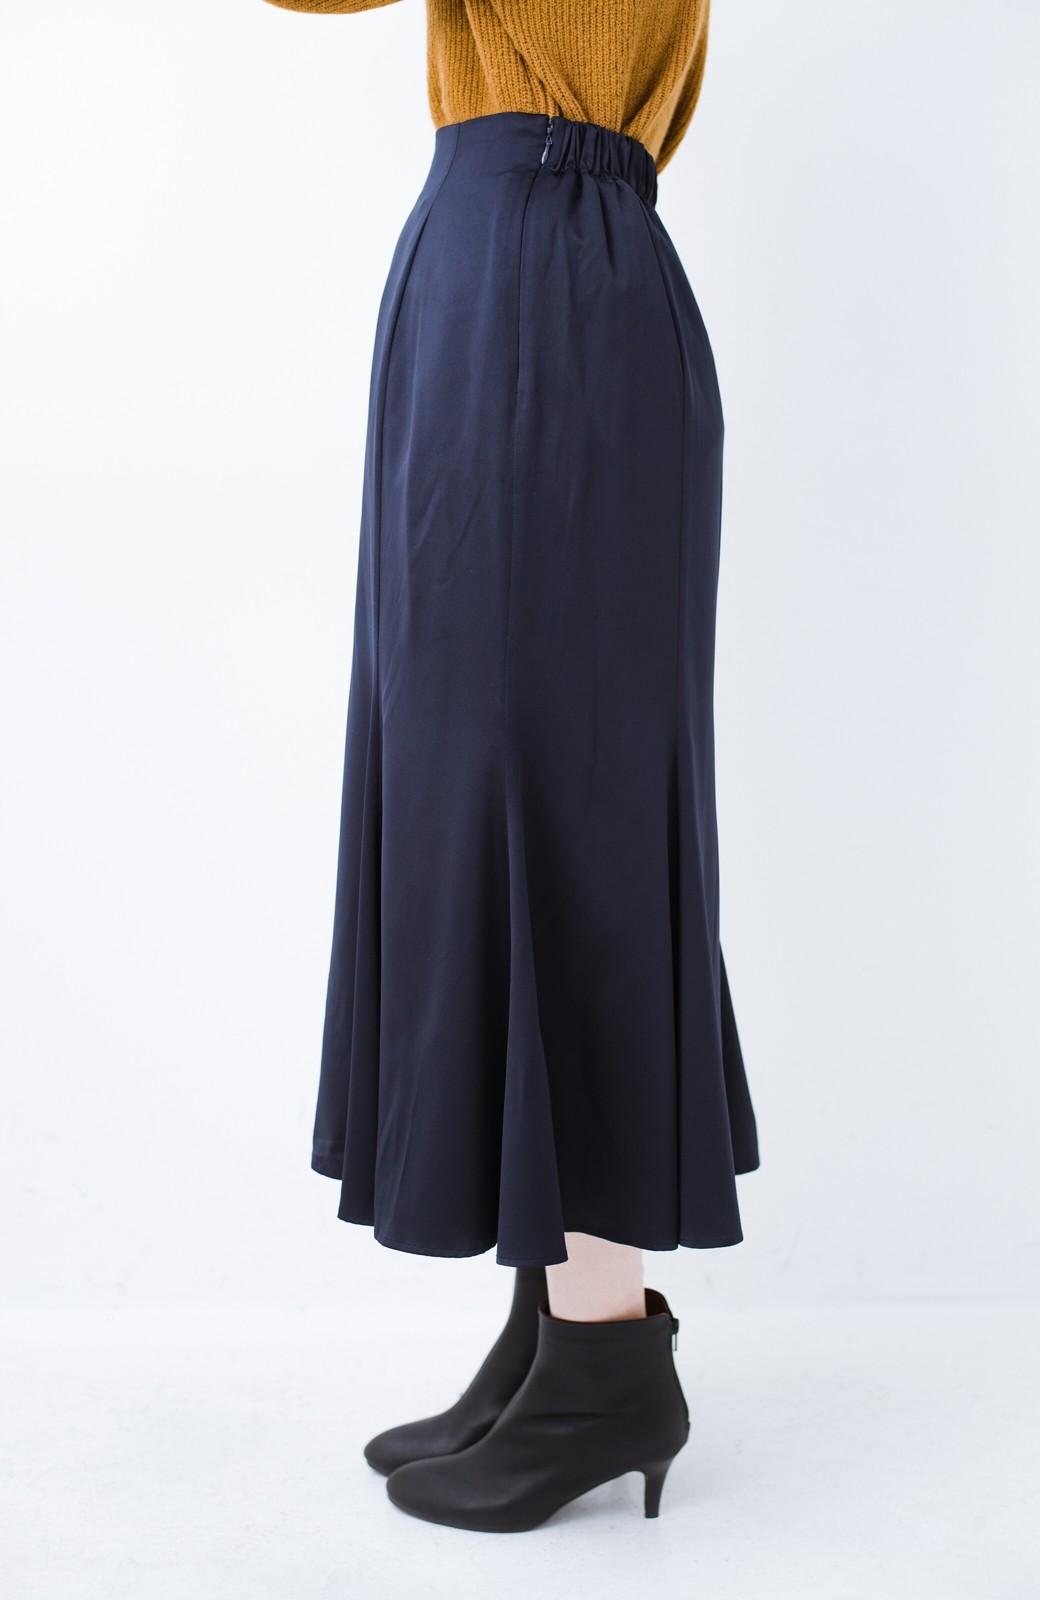 haco! スウェットやスニーカーを合わせても女っぽくいられるサテンマーメイドスカート by que made me <ネイビー>の商品写真13